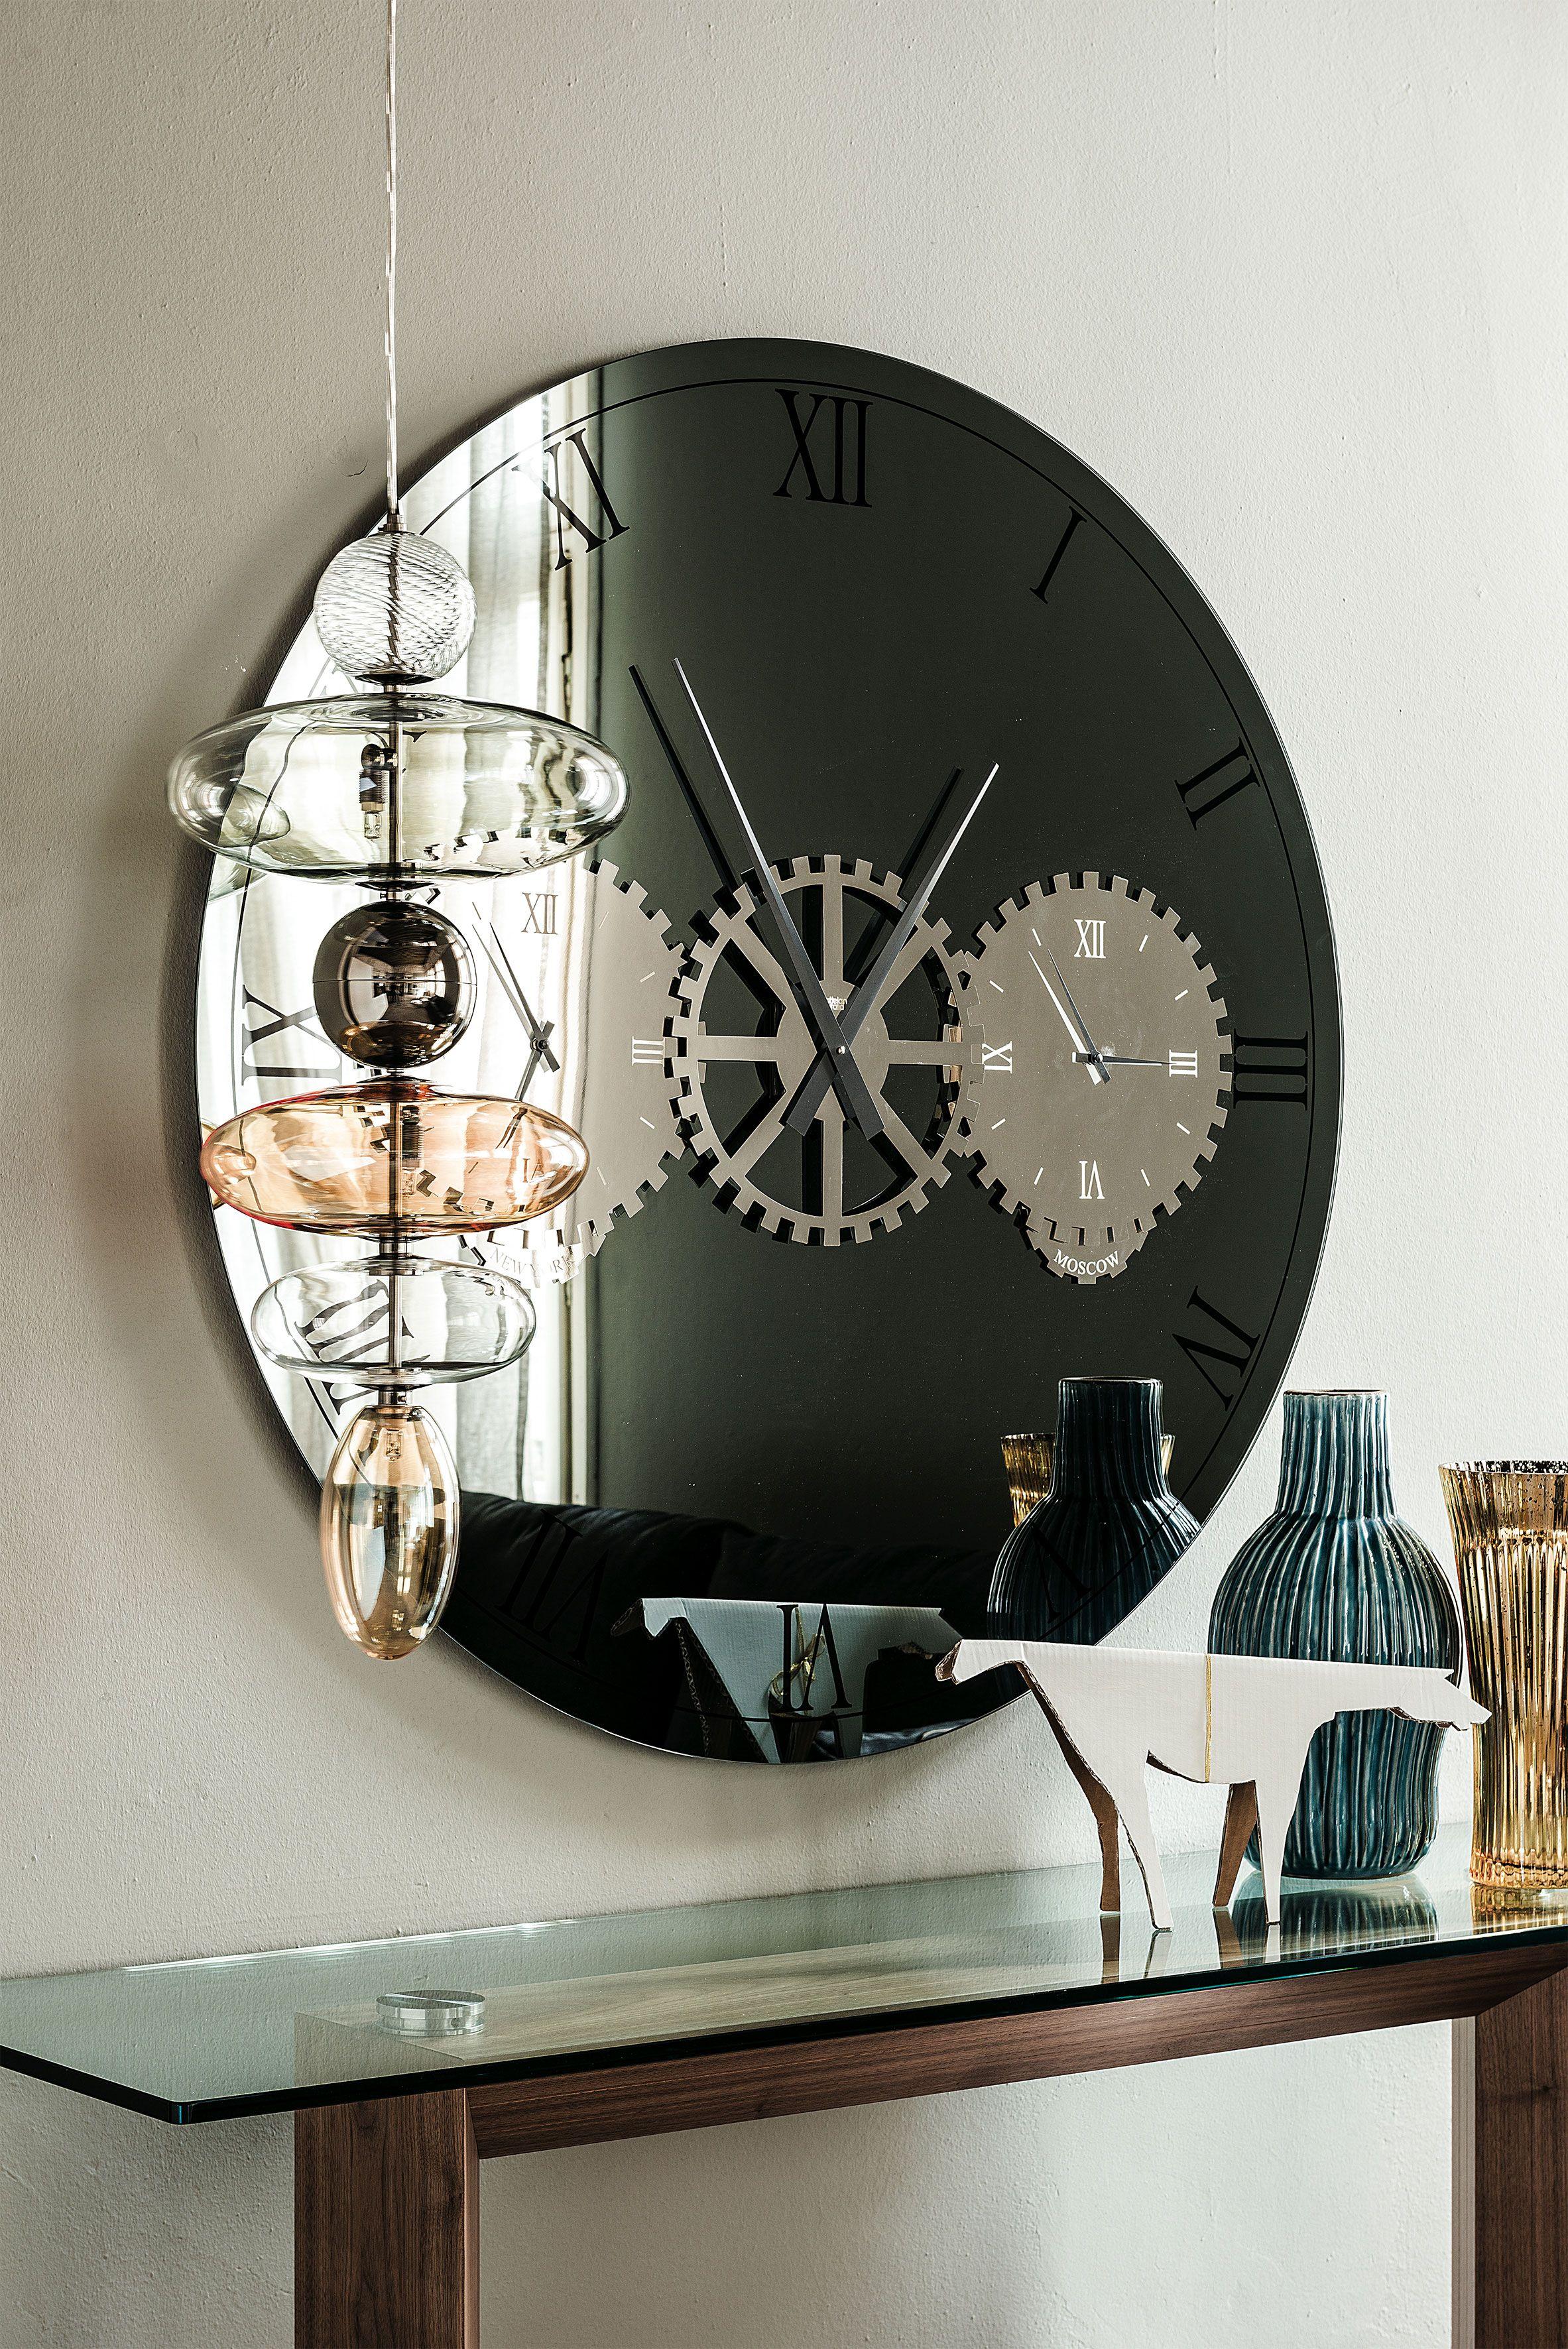 Times Mirror Cattelan Italia Oversized Wall Clock Cattelan Italia Big Clocks